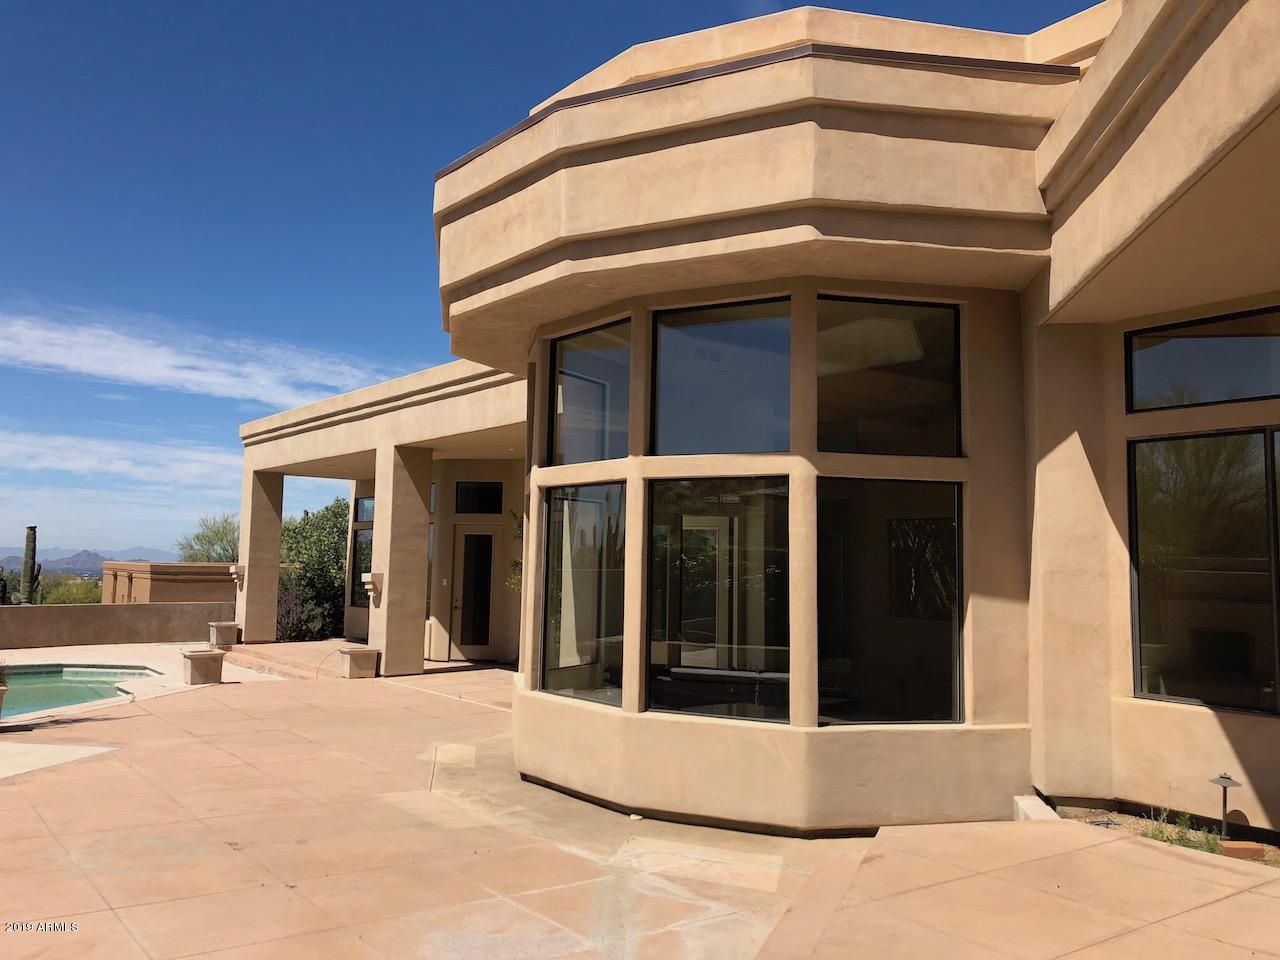 MLS 5949292 10040 E HAPPY VALLEY Road Unit 465, Scottsdale, AZ 85255 Scottsdale AZ Private Pool